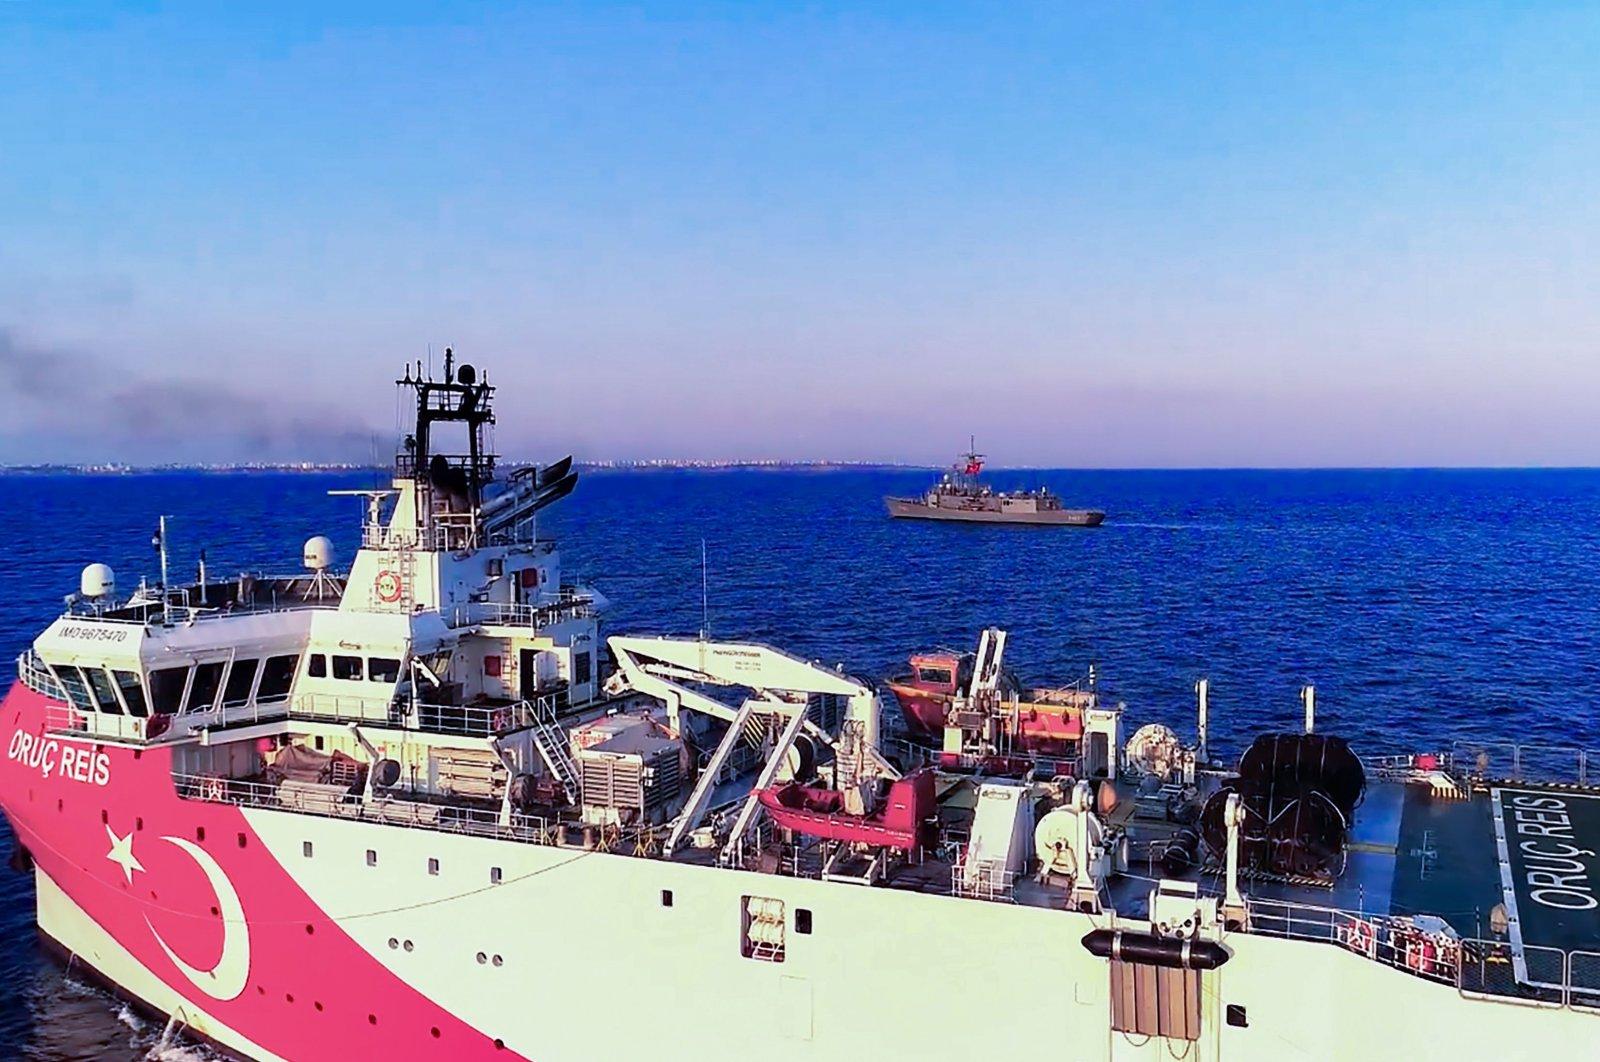 Turkish seismic research vessel 'Oruç Reis' heading in the west of Antalya on the eastern Mediterranean Sea, Aug.12, 2020. (AFP)